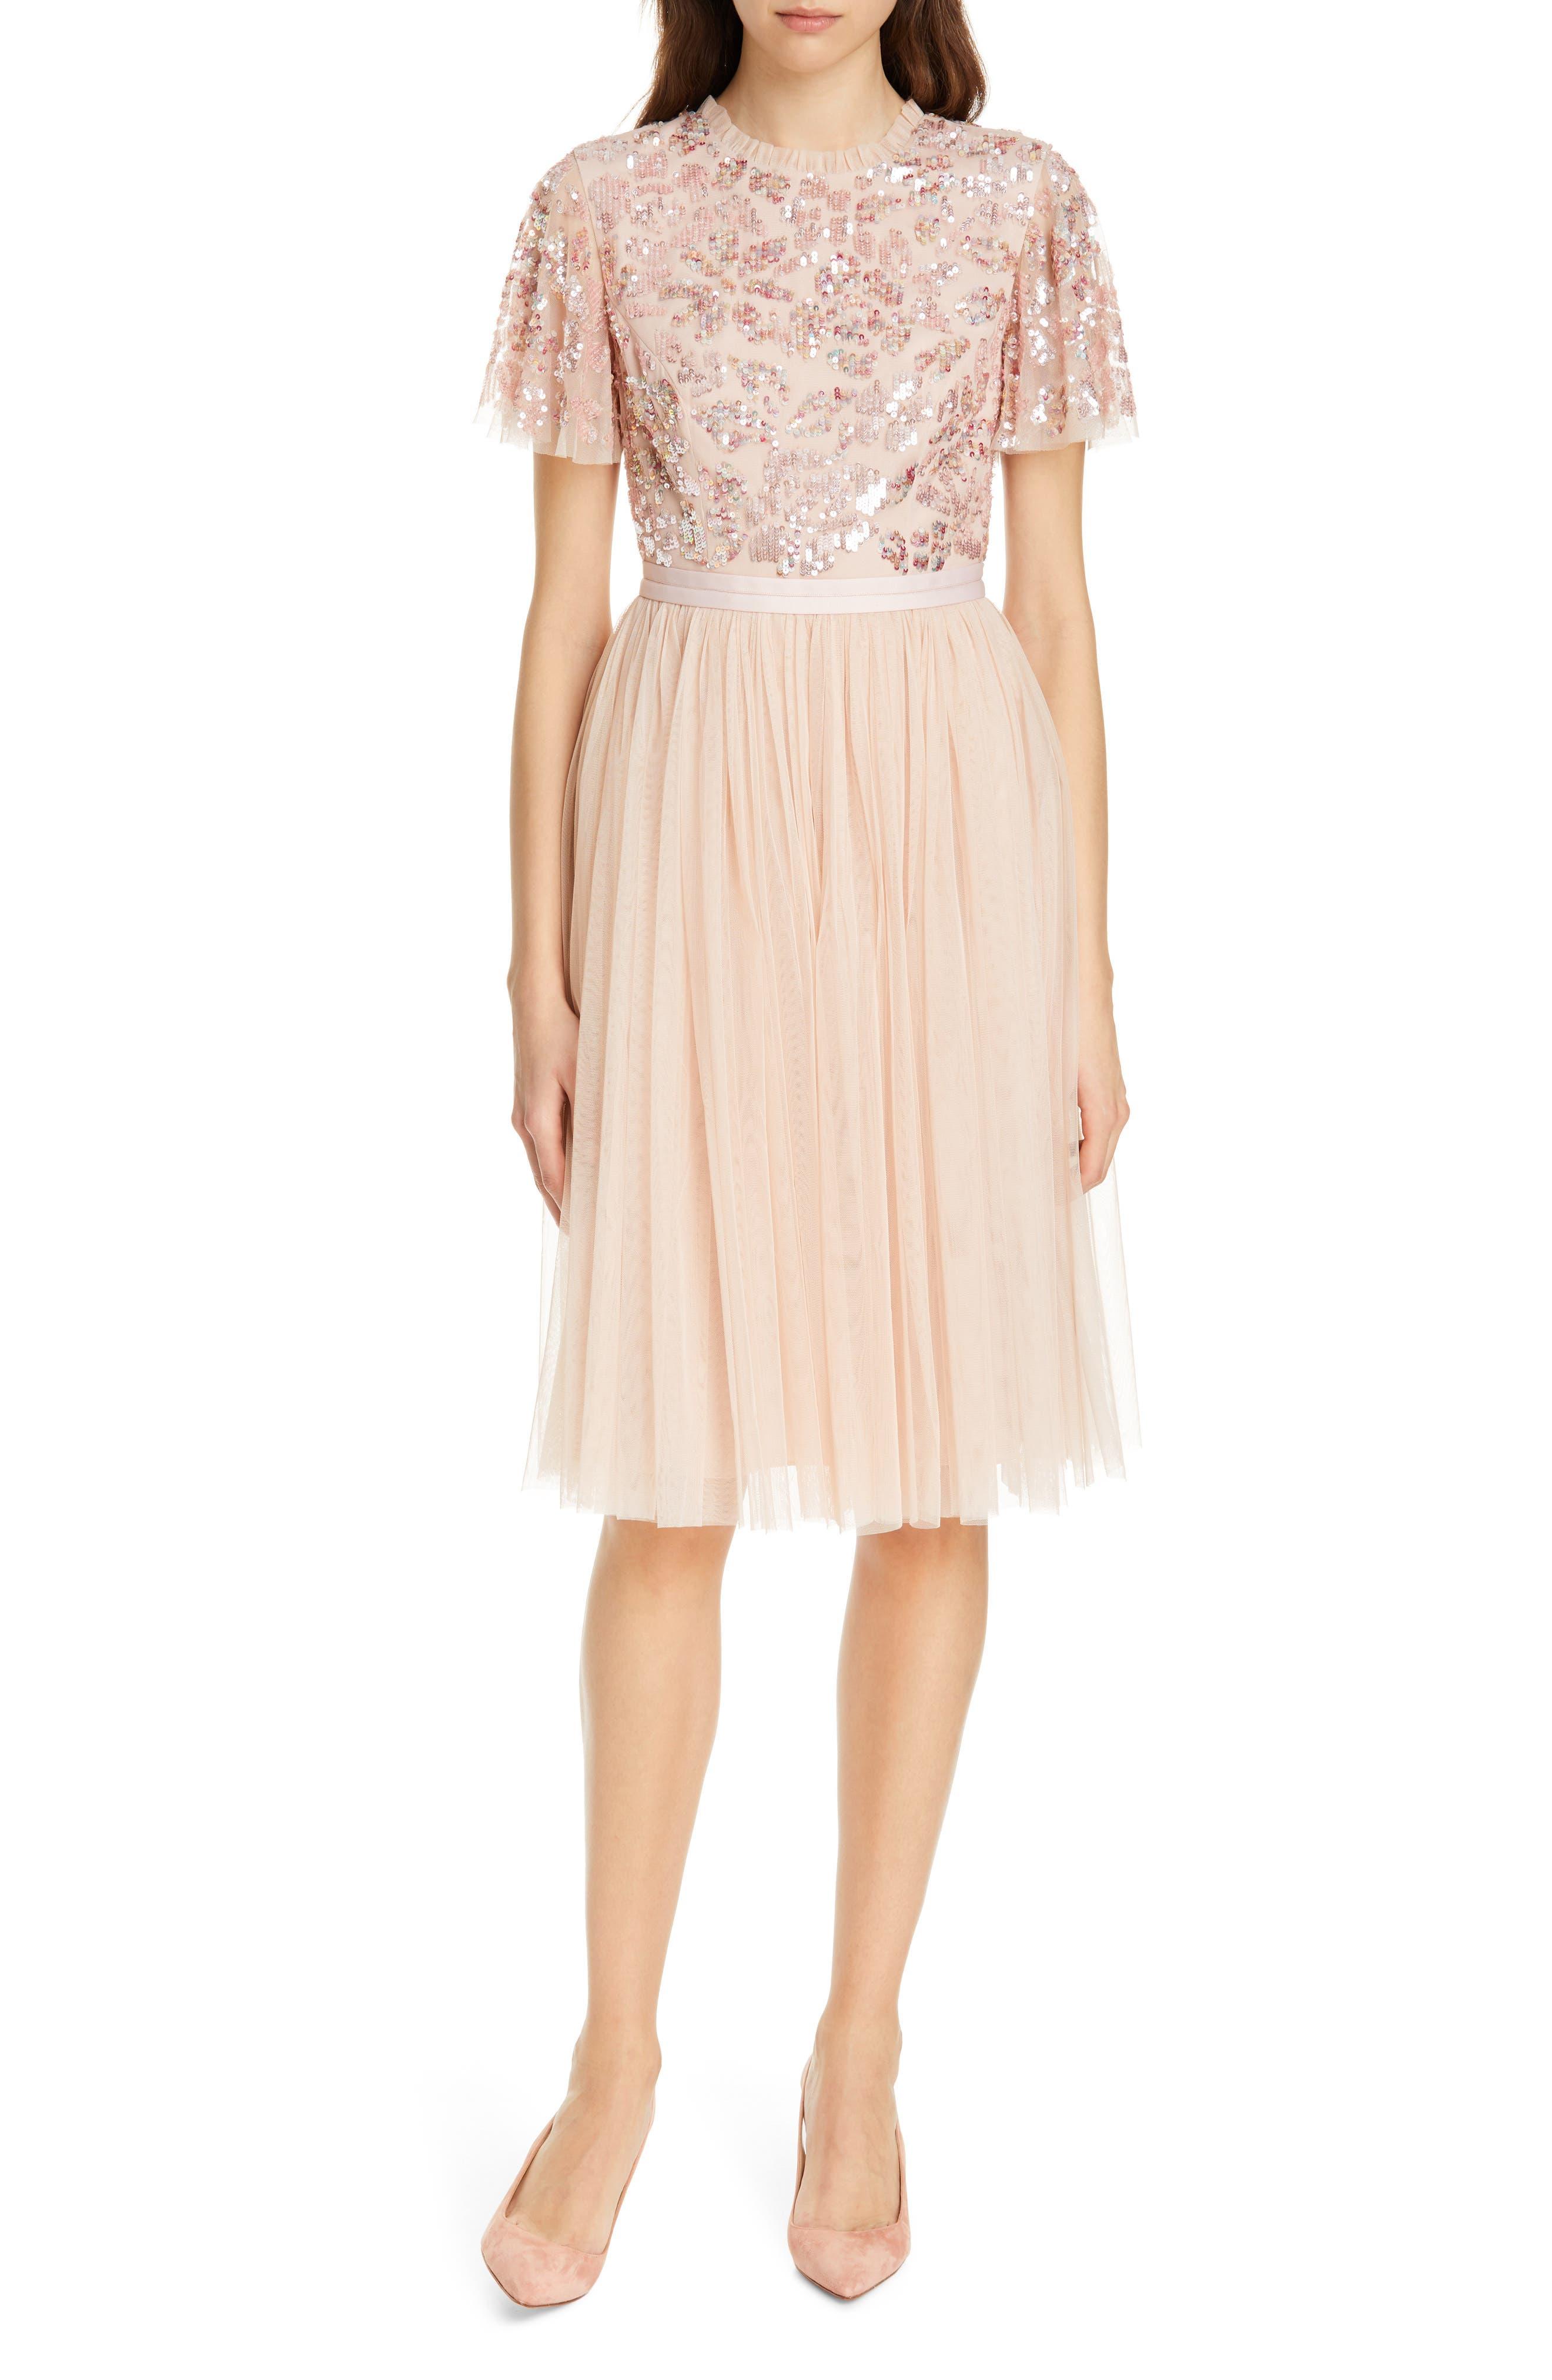 Needle & Thread Dream Rose A-Line Dress, Pink